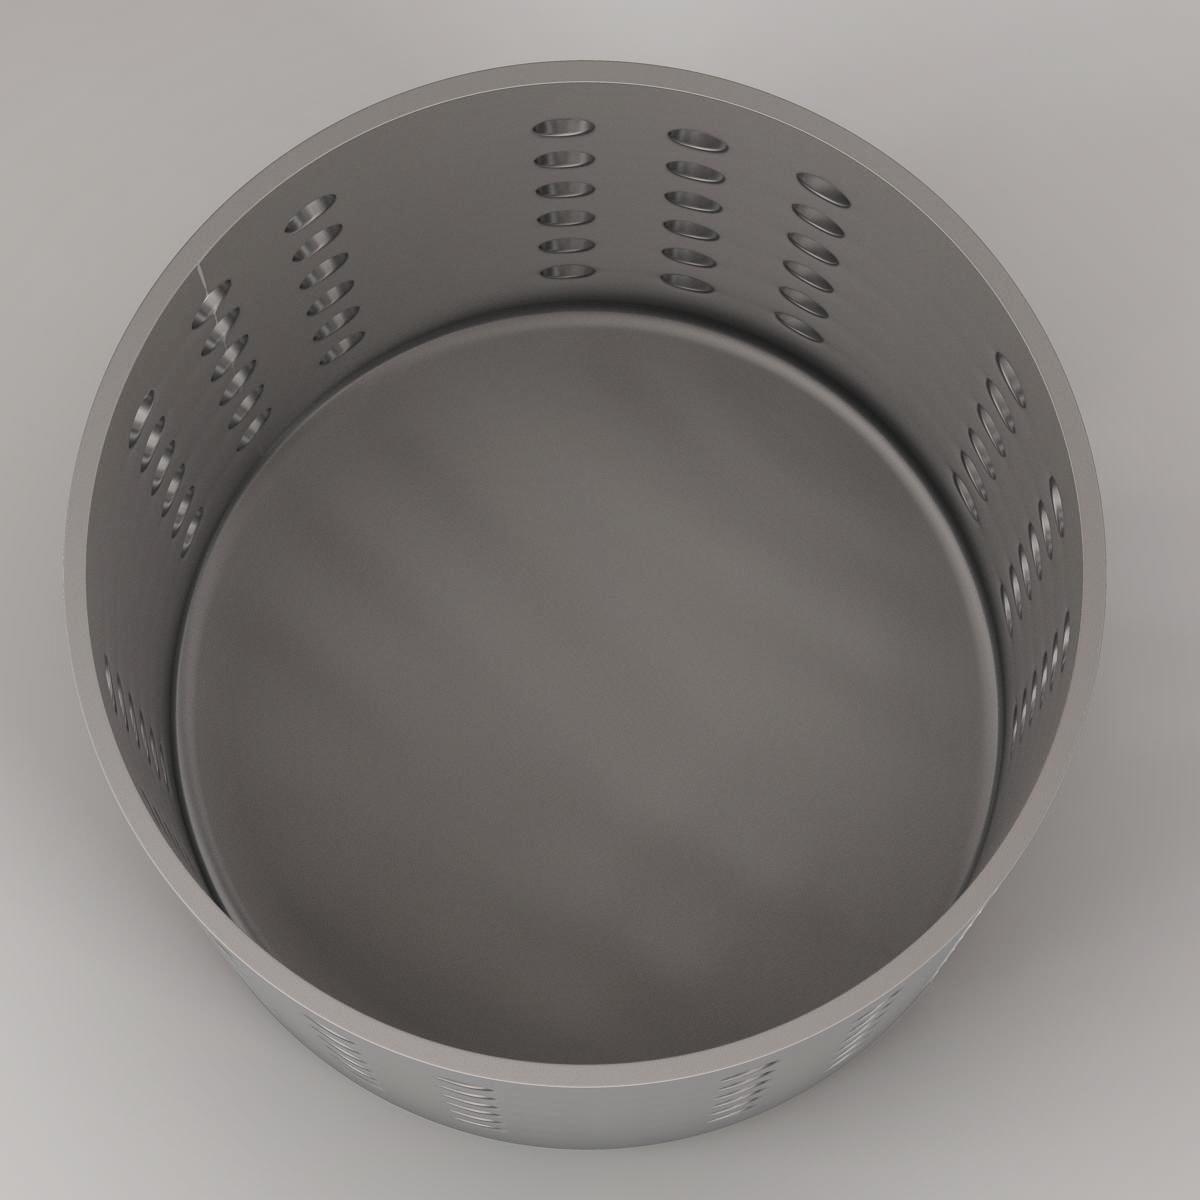 cooking utensils stand 3d model 3ds max fbx c4d ma mb obj 159203